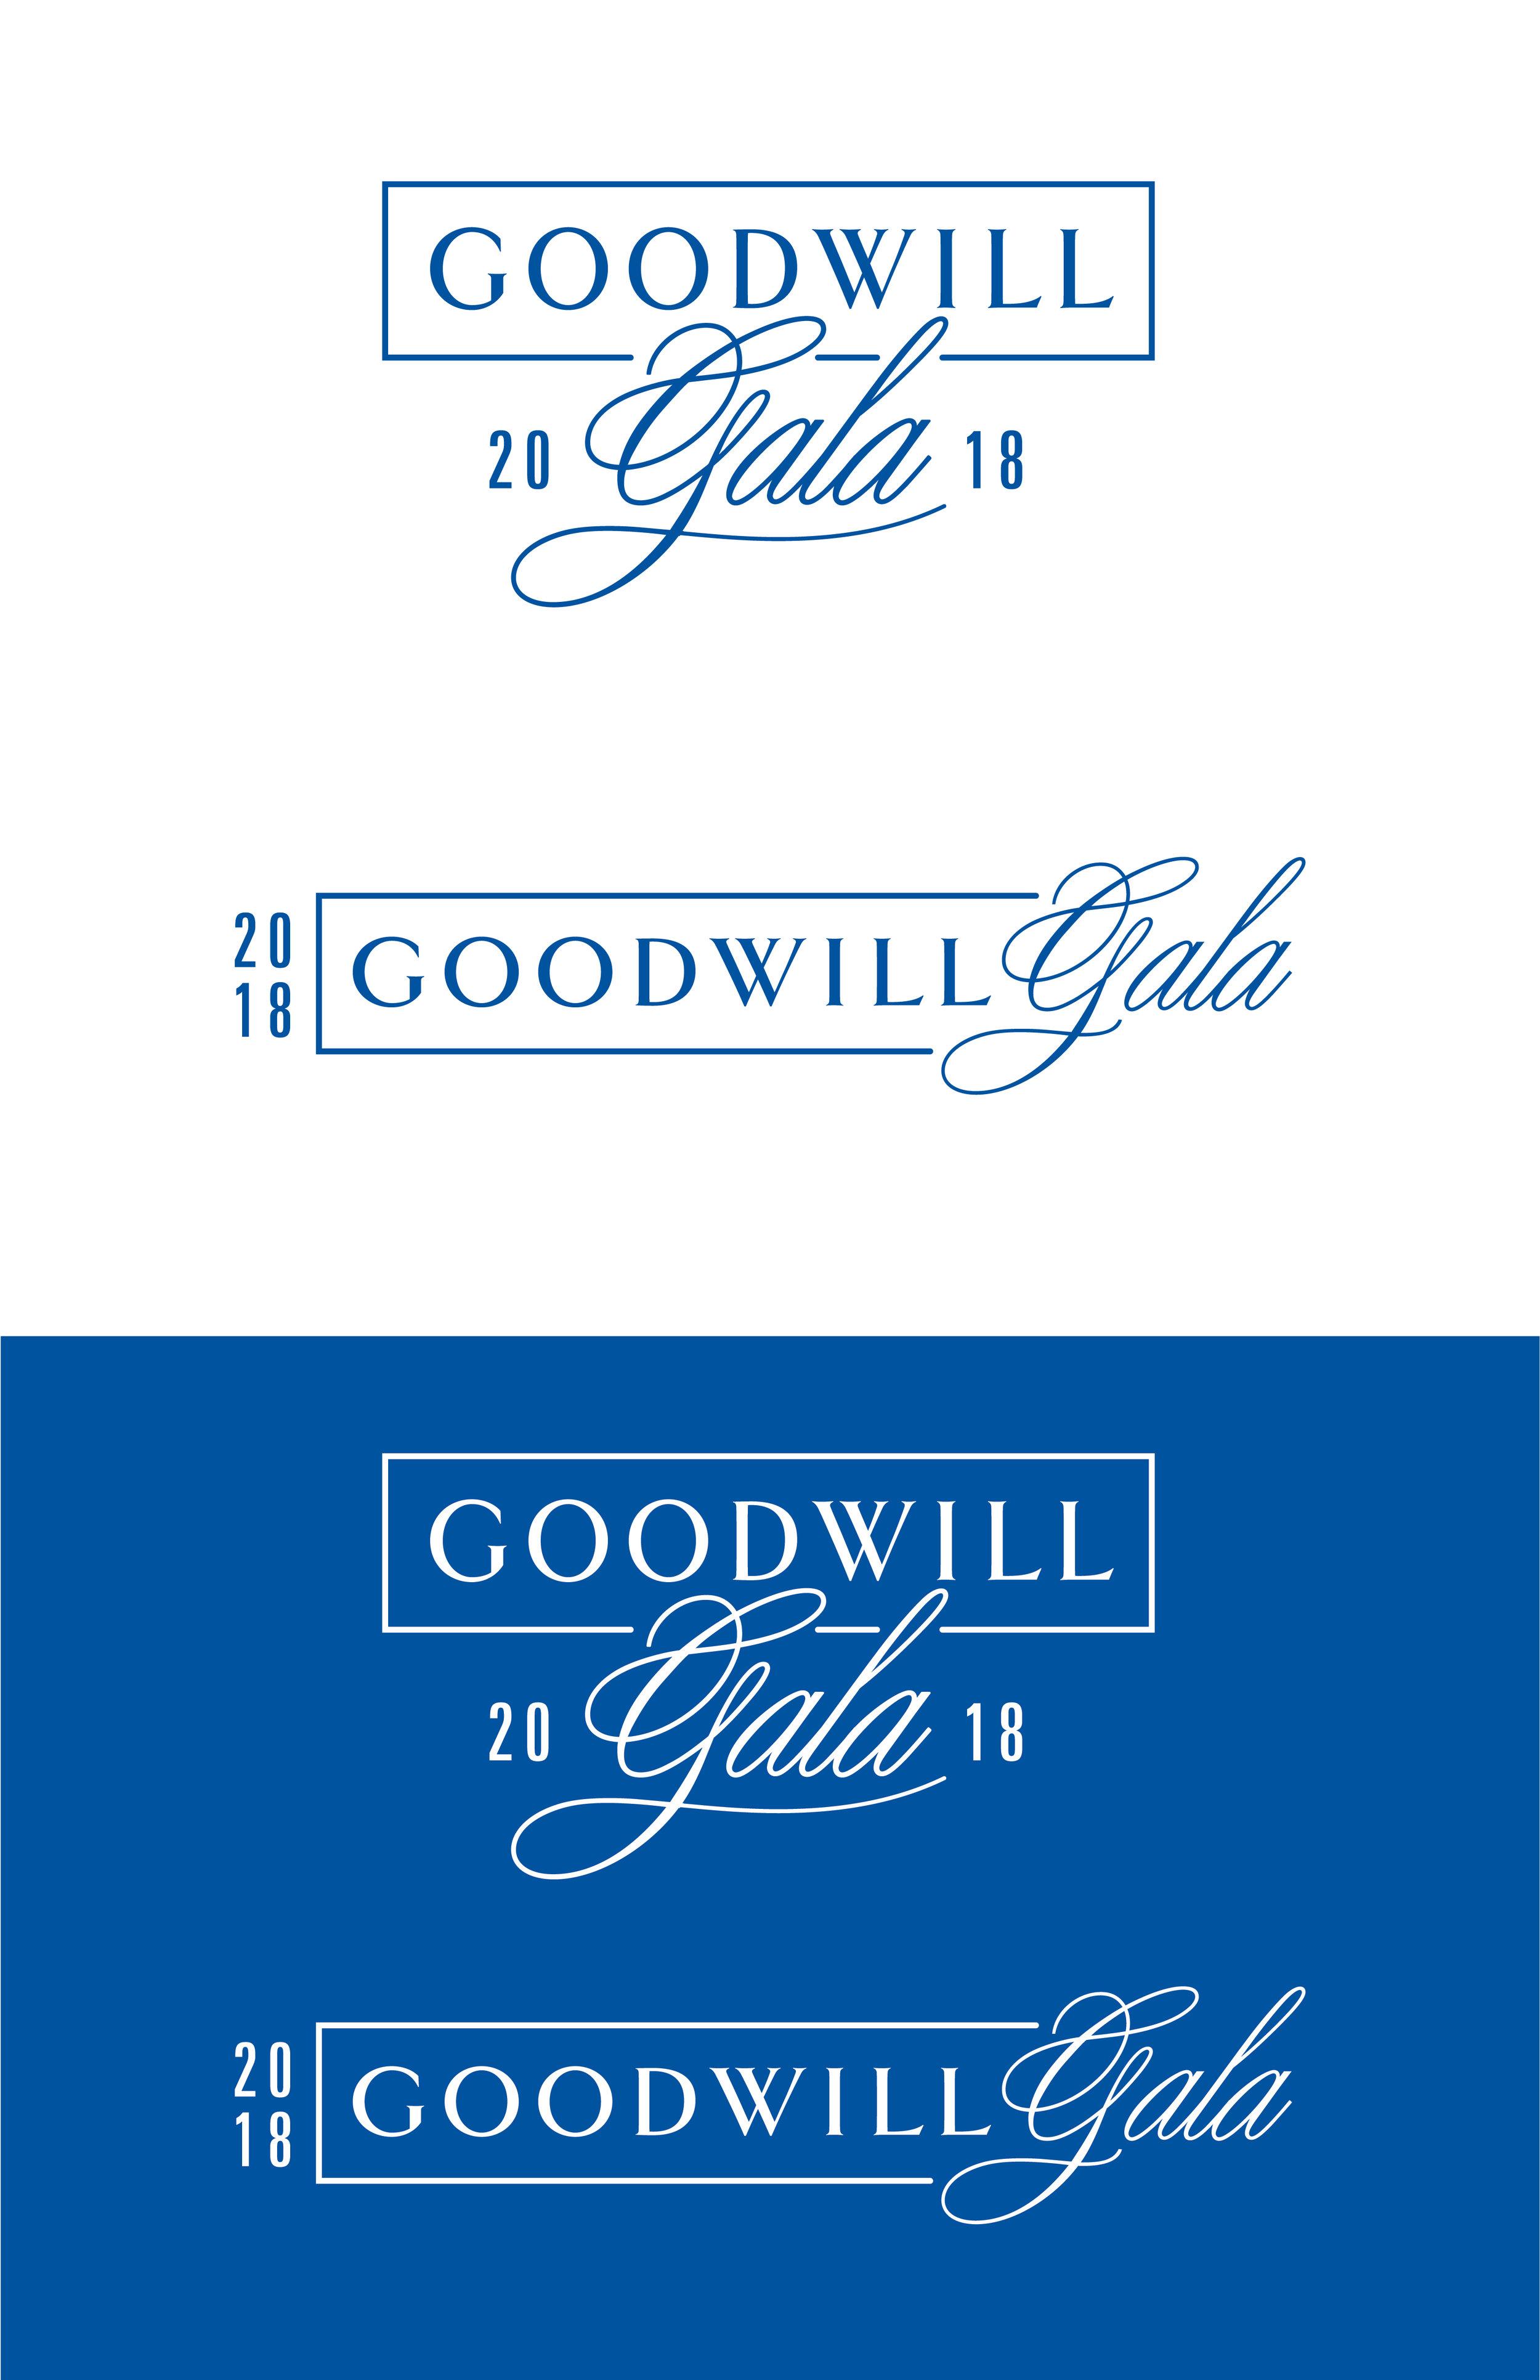 GW_Gala_Logos.jpg